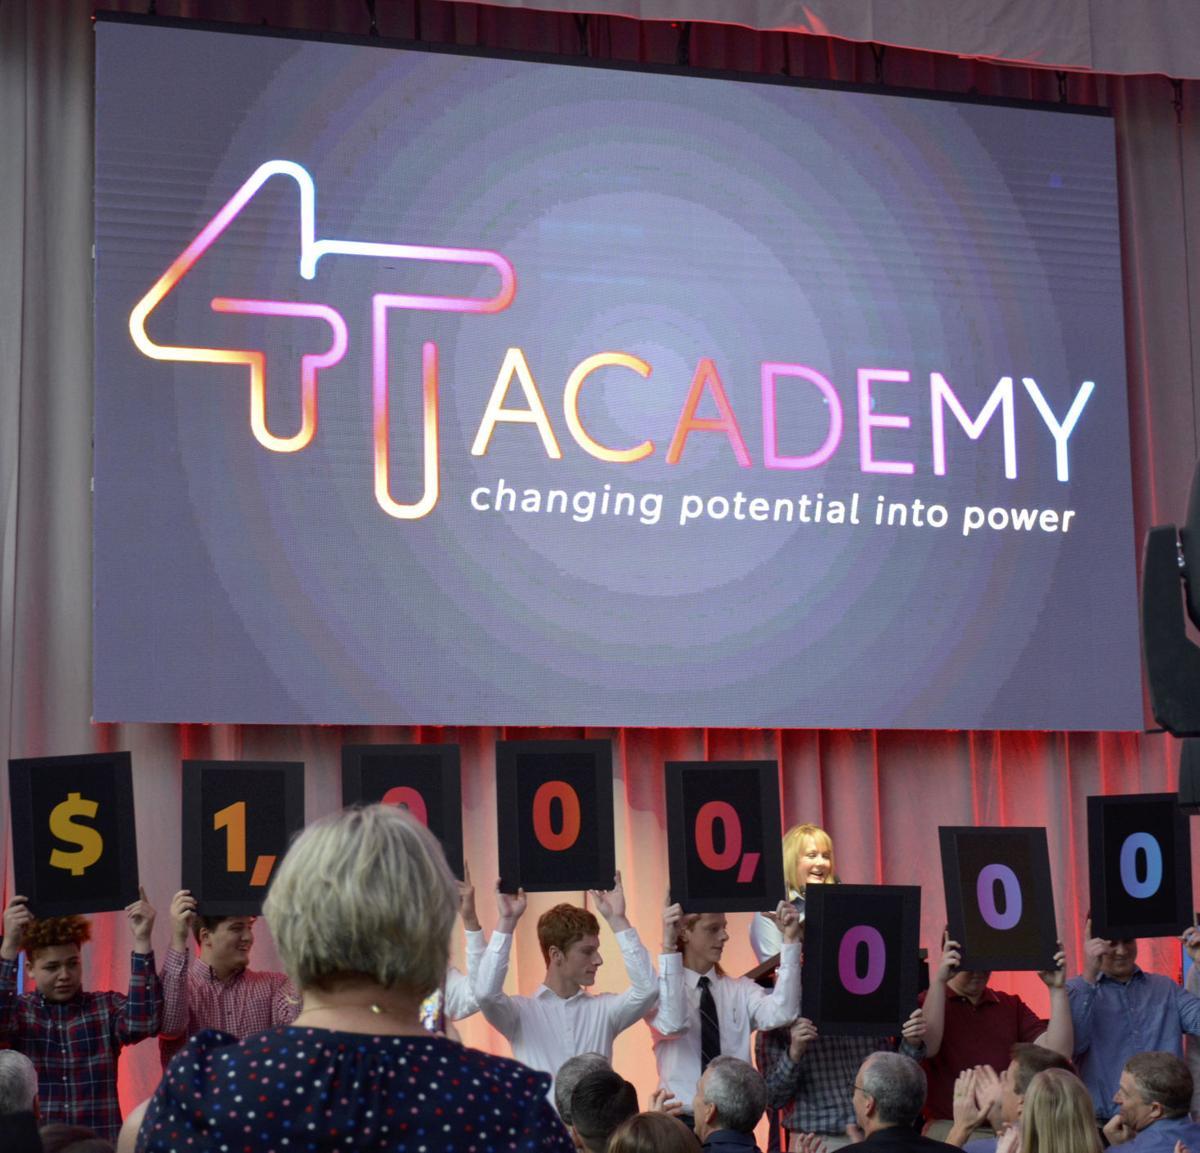 4T Academy Pledge.jpg